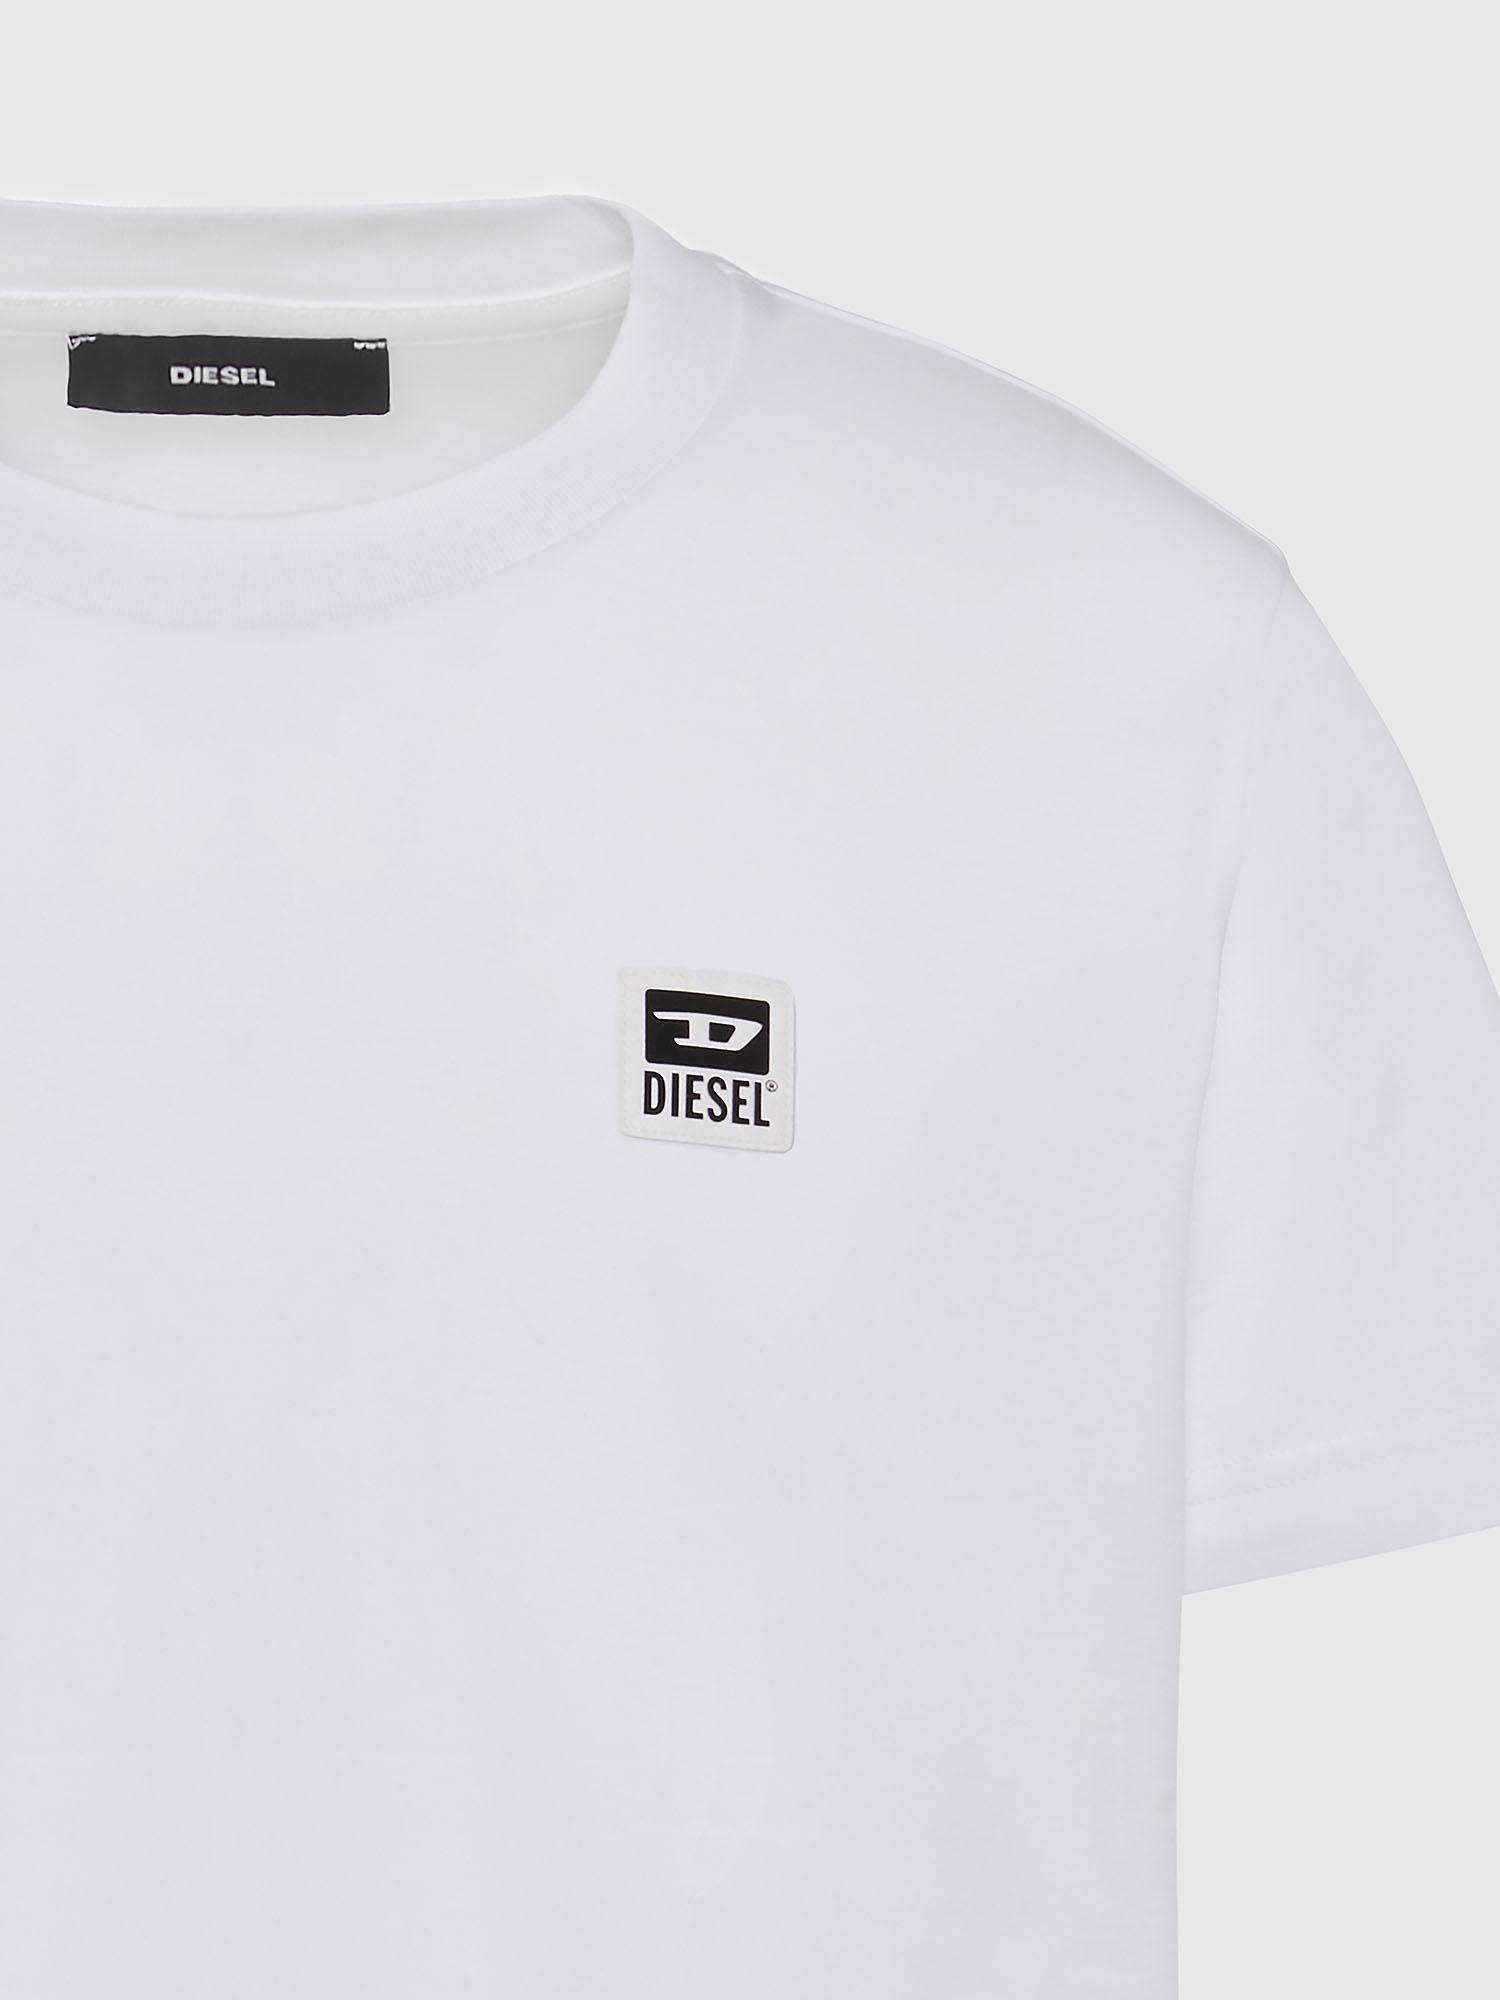 Diesel T-shirt Diesel A00356-0AAXJ-100